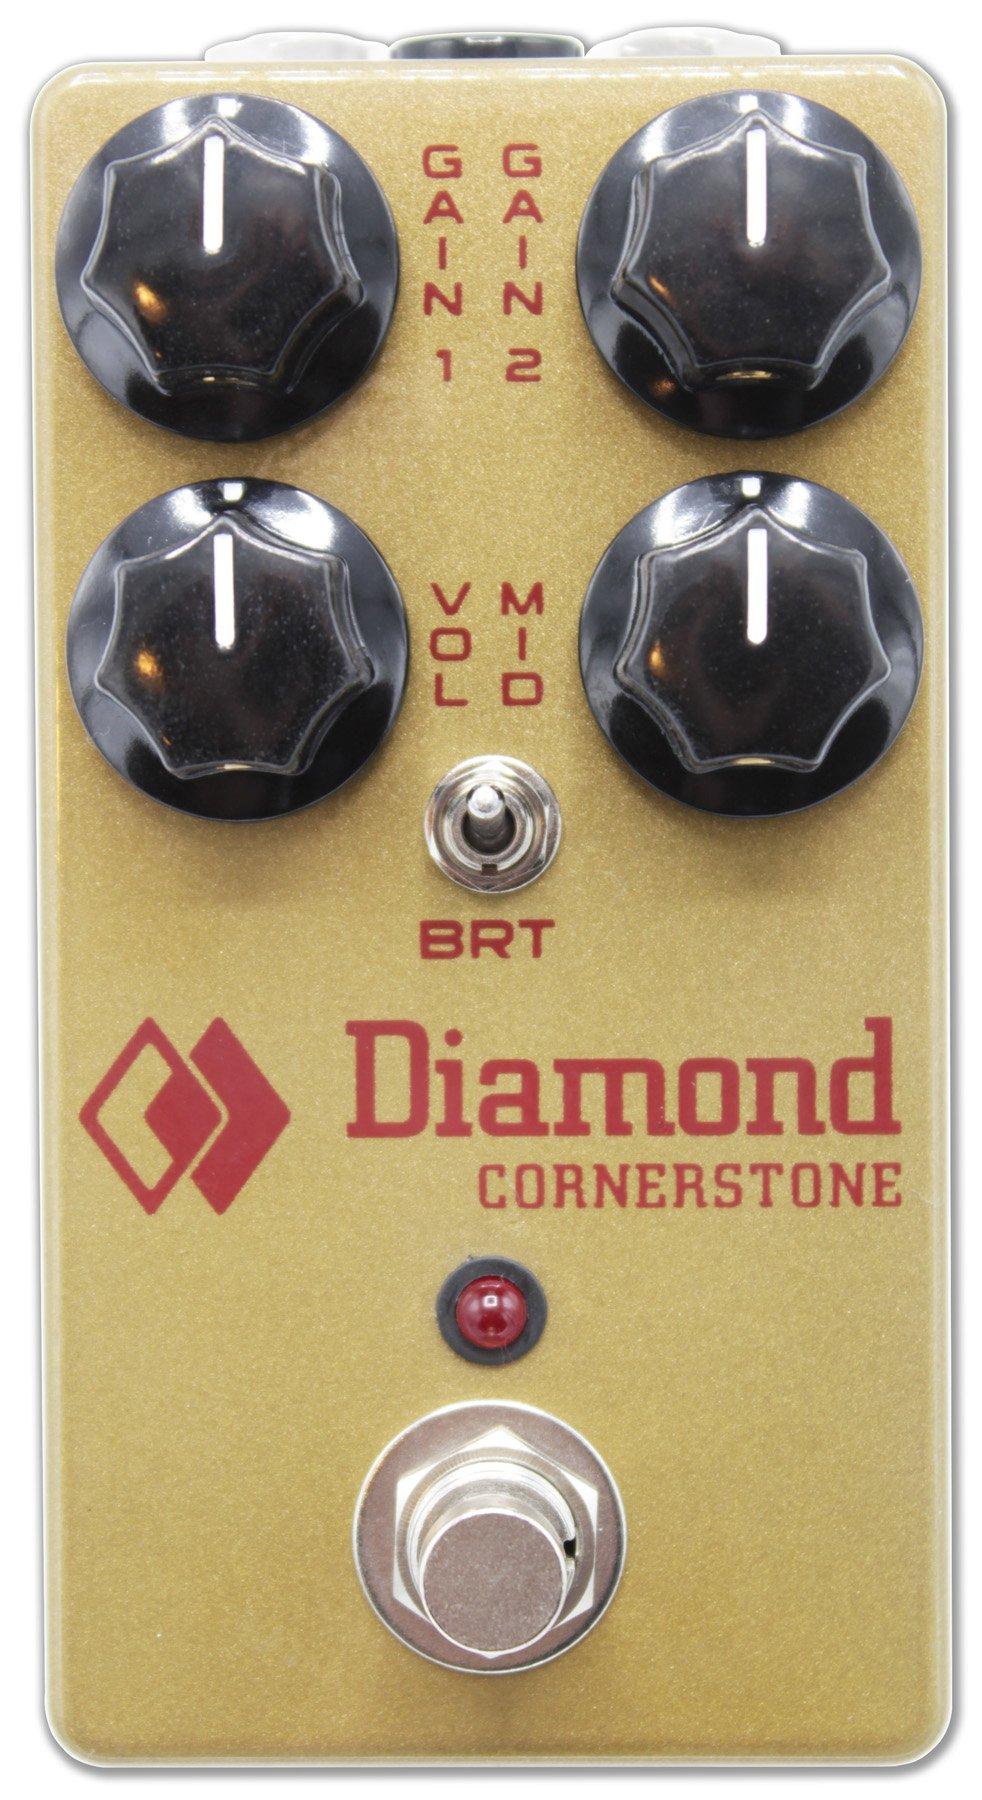 Diamond Cornerstone Dual Gain